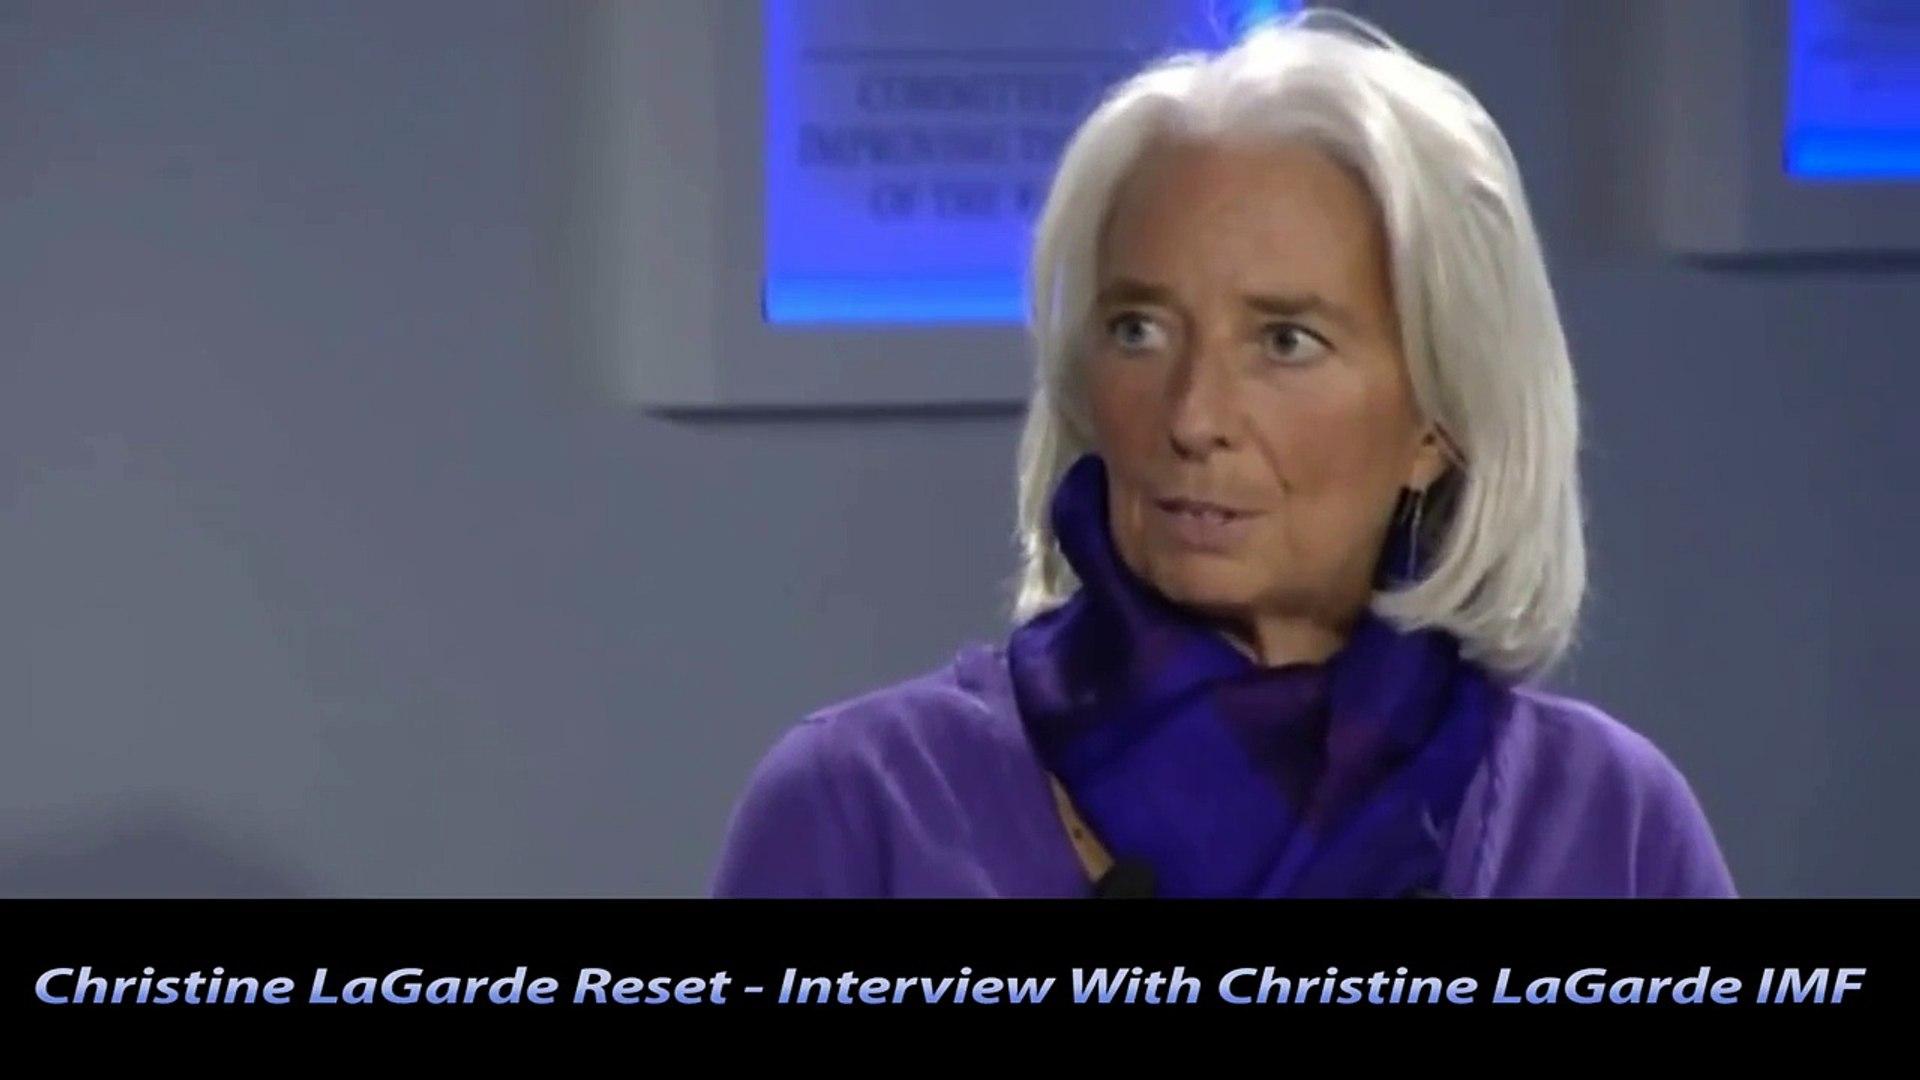 Christine LaGarde Reset - Interview With Christine LaGarde IMF